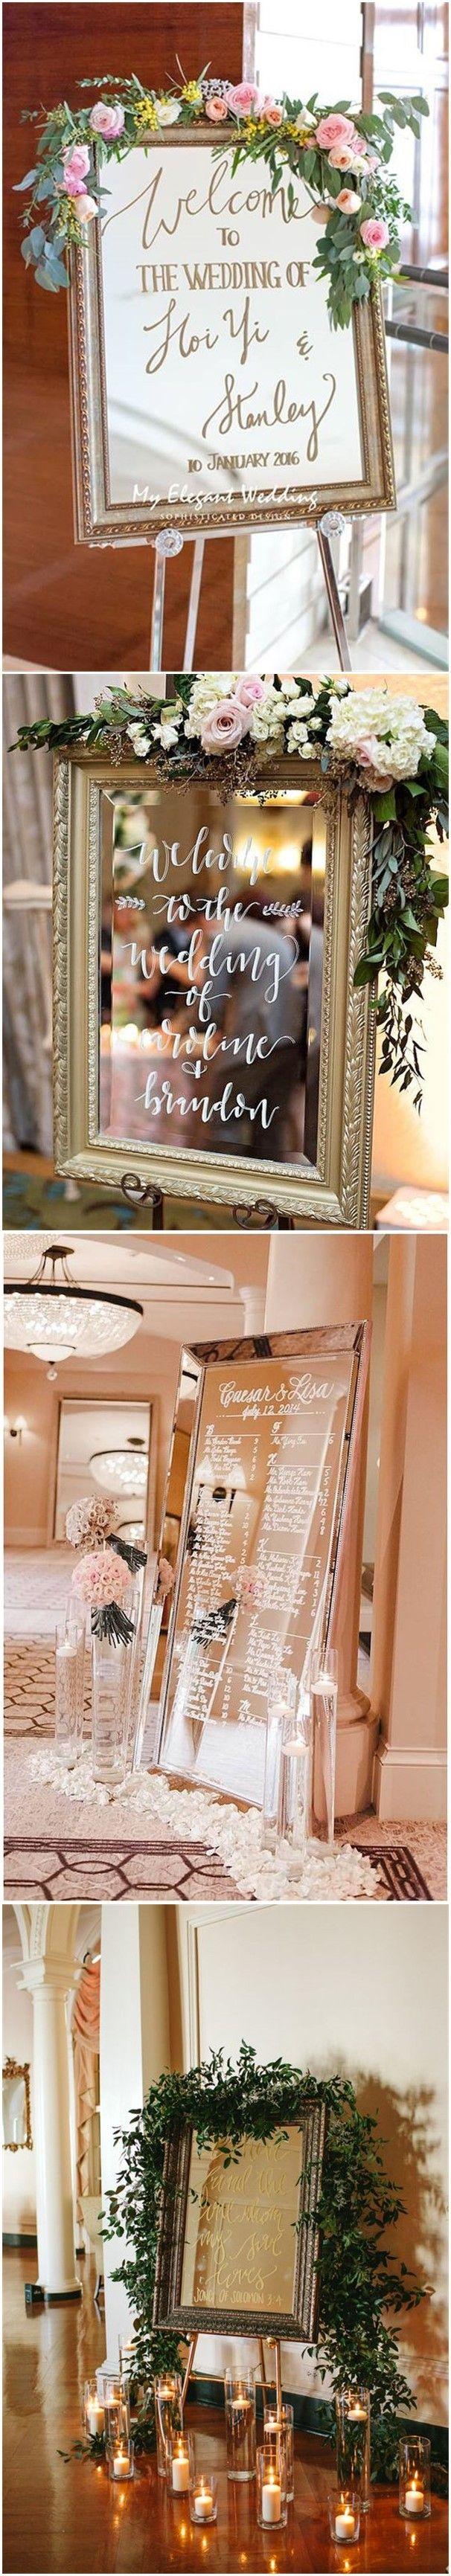 vintage mirror wedding sign decoration ideas decoration